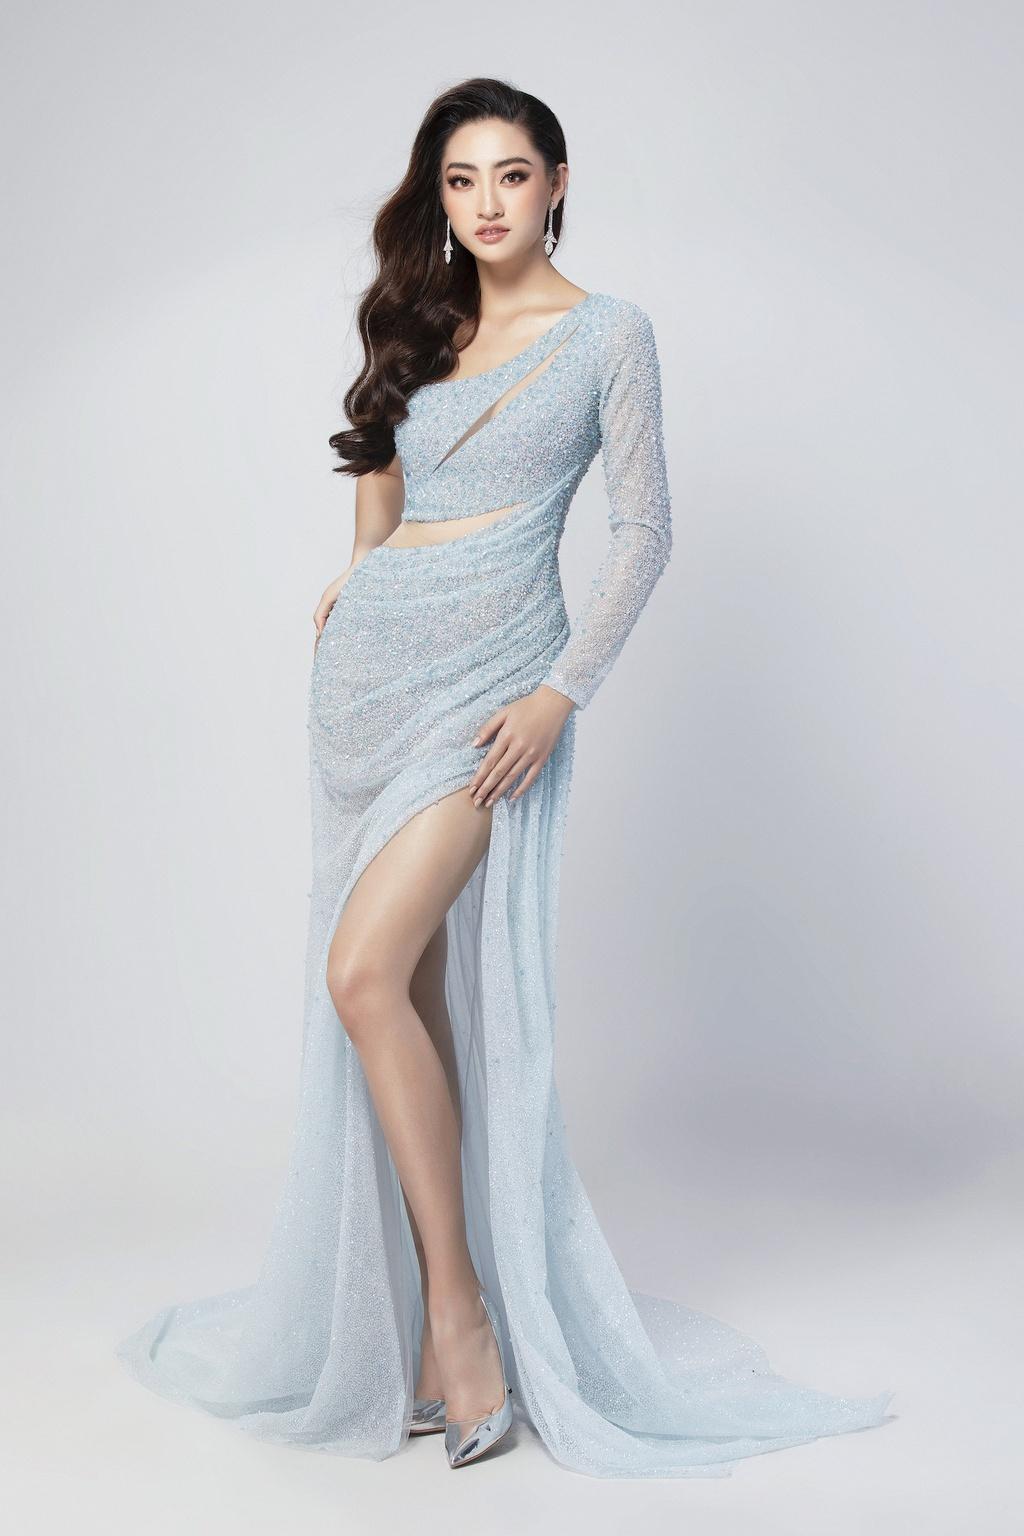 Luong Thuy Linh mac vay xe cao khoe chan 1,22 m o chung ket Miss World hinh anh 6 null